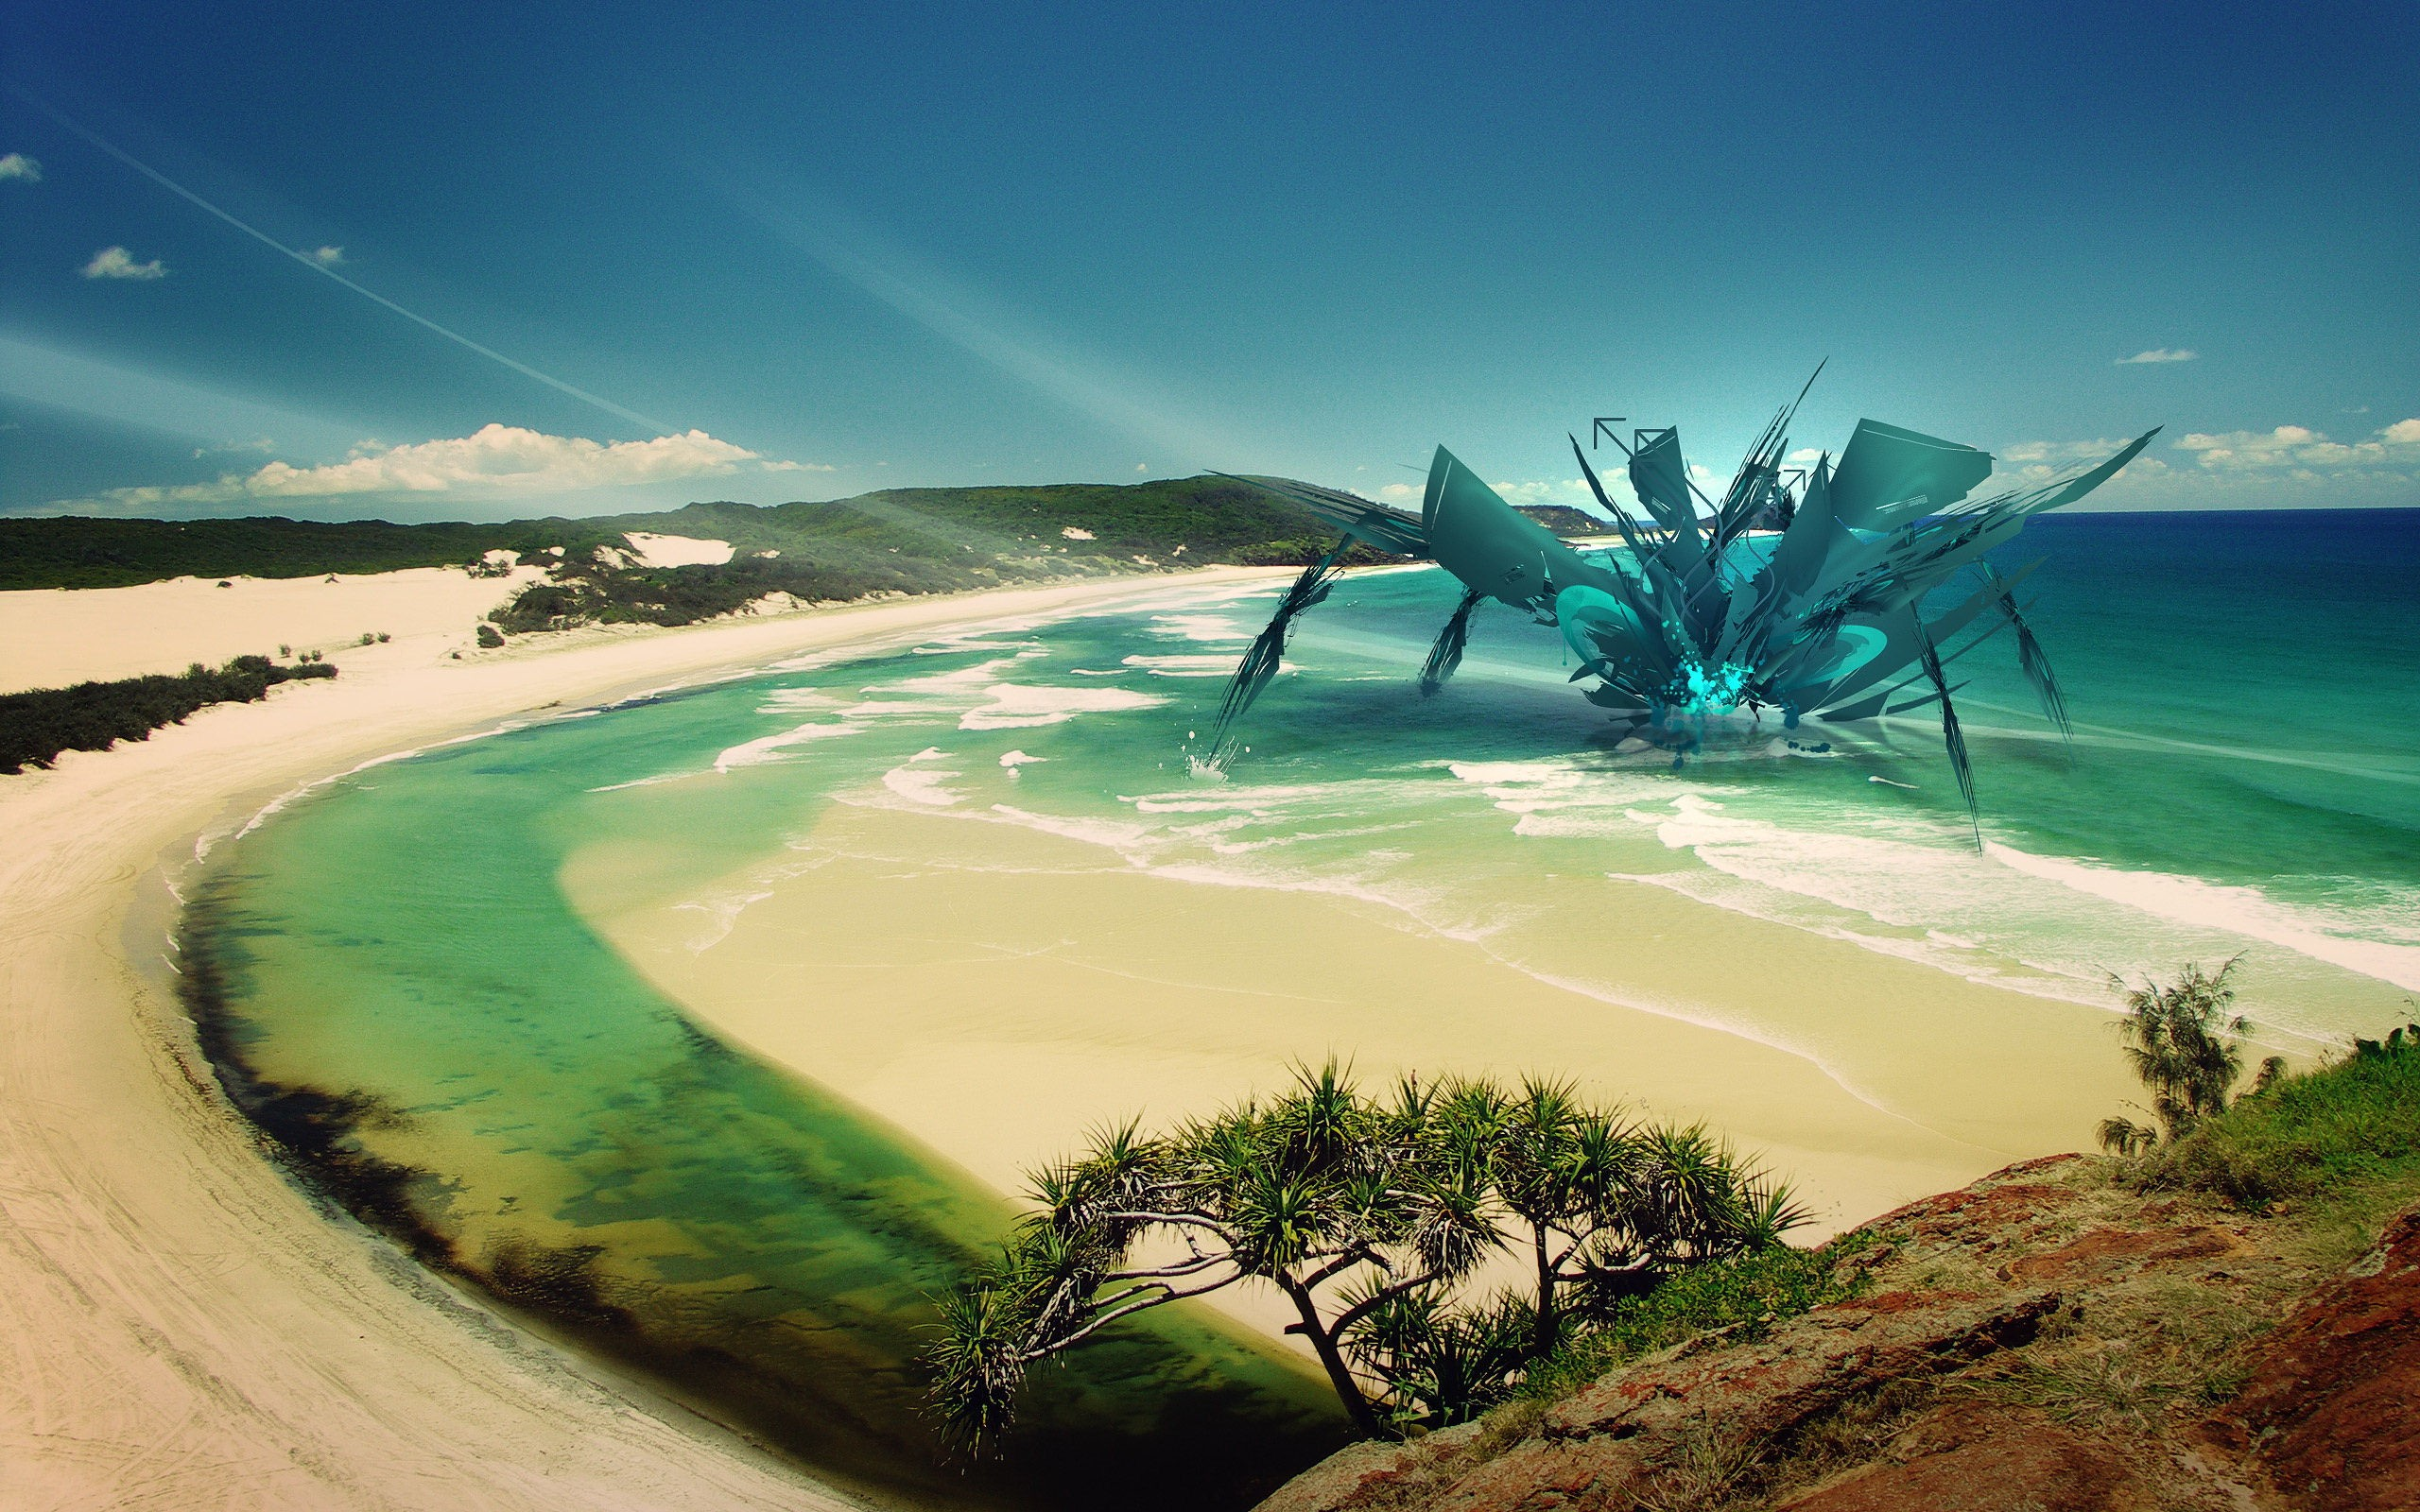 perus northern beaches died - HD1920×1080